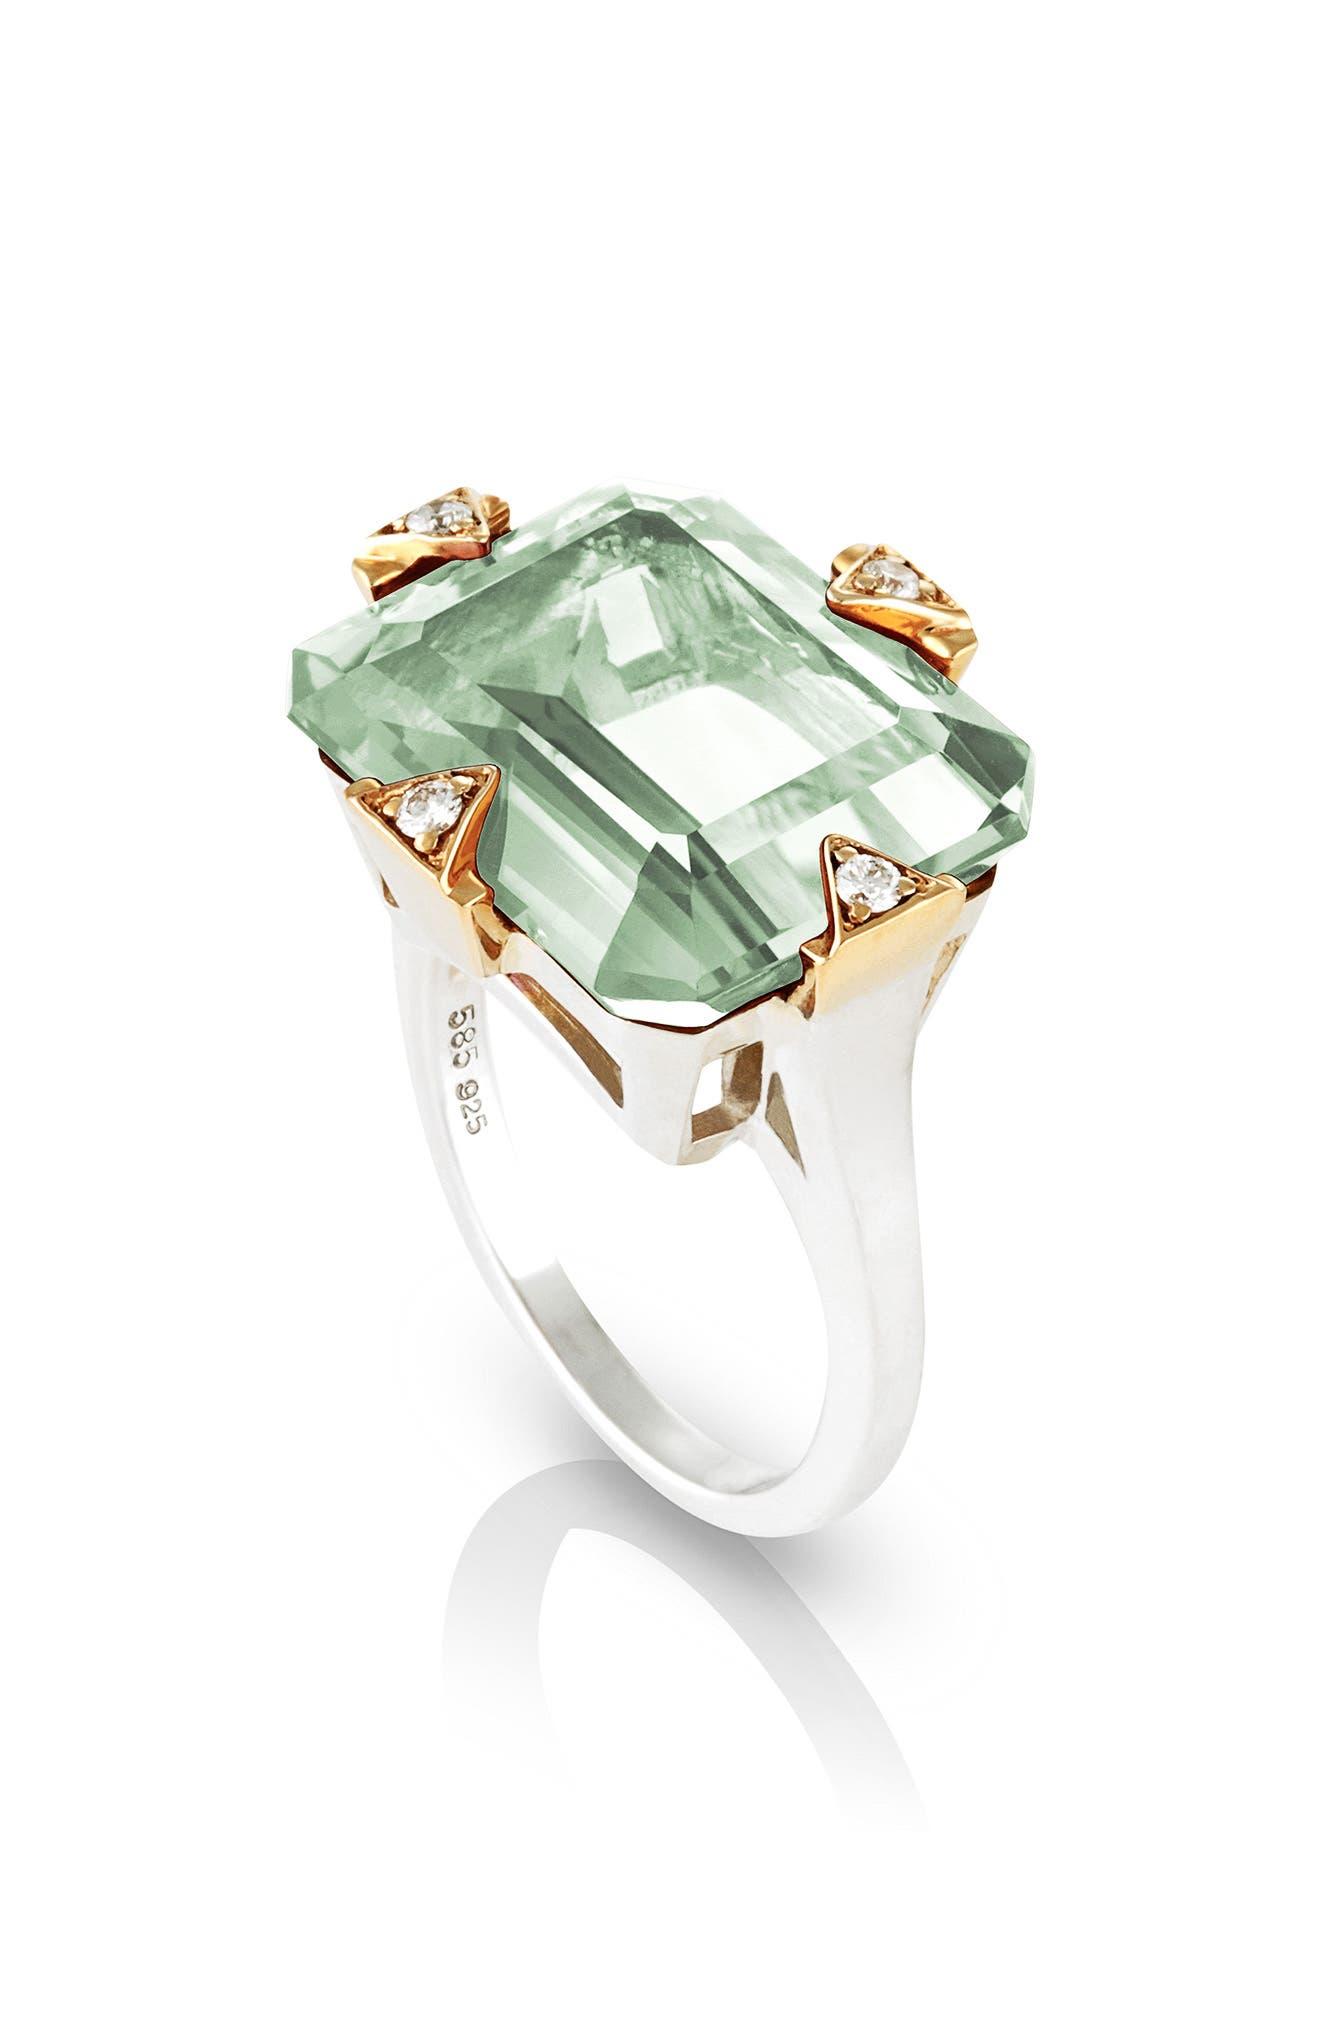 Prasiolite Cocktail Ring with Diamonds,                             Main thumbnail 1, color,                             PRASIOLITE